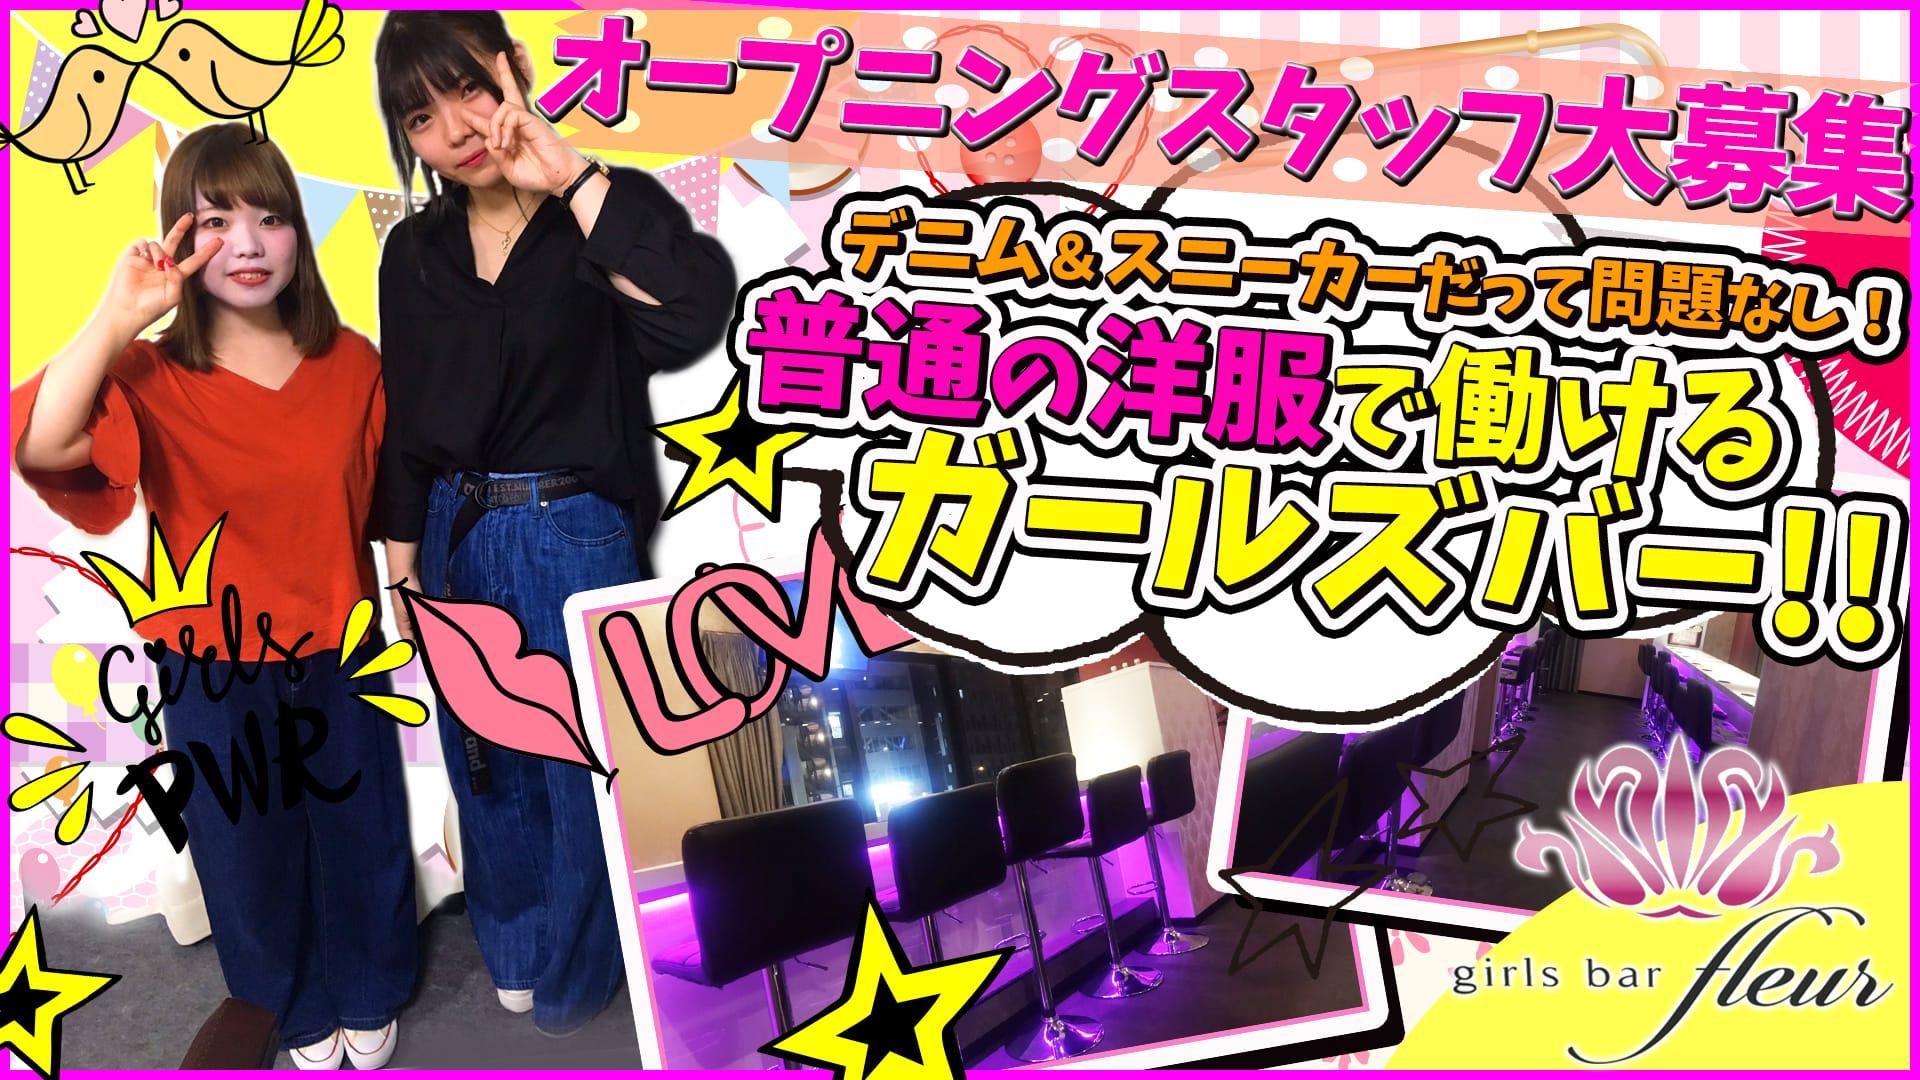 girls bar fluer<フルール> 新宿 ガールズバー TOP画像